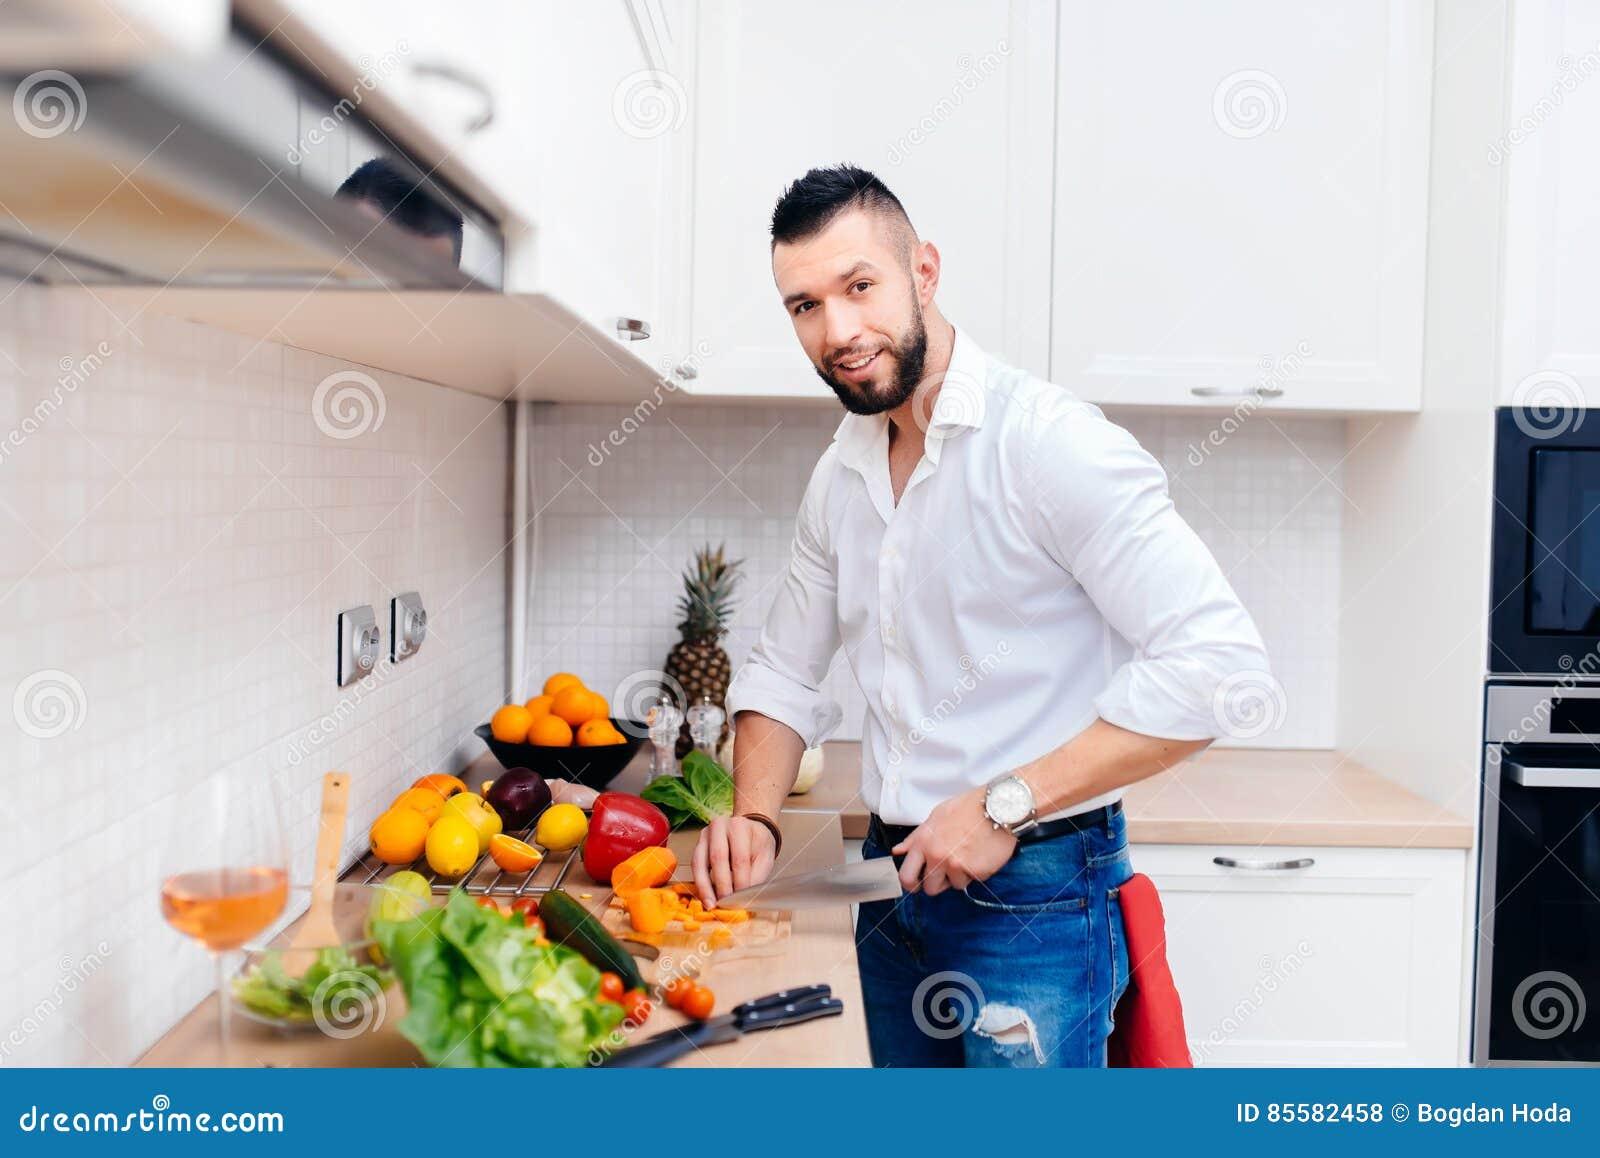 The Happy Kitchen Good Mood Food